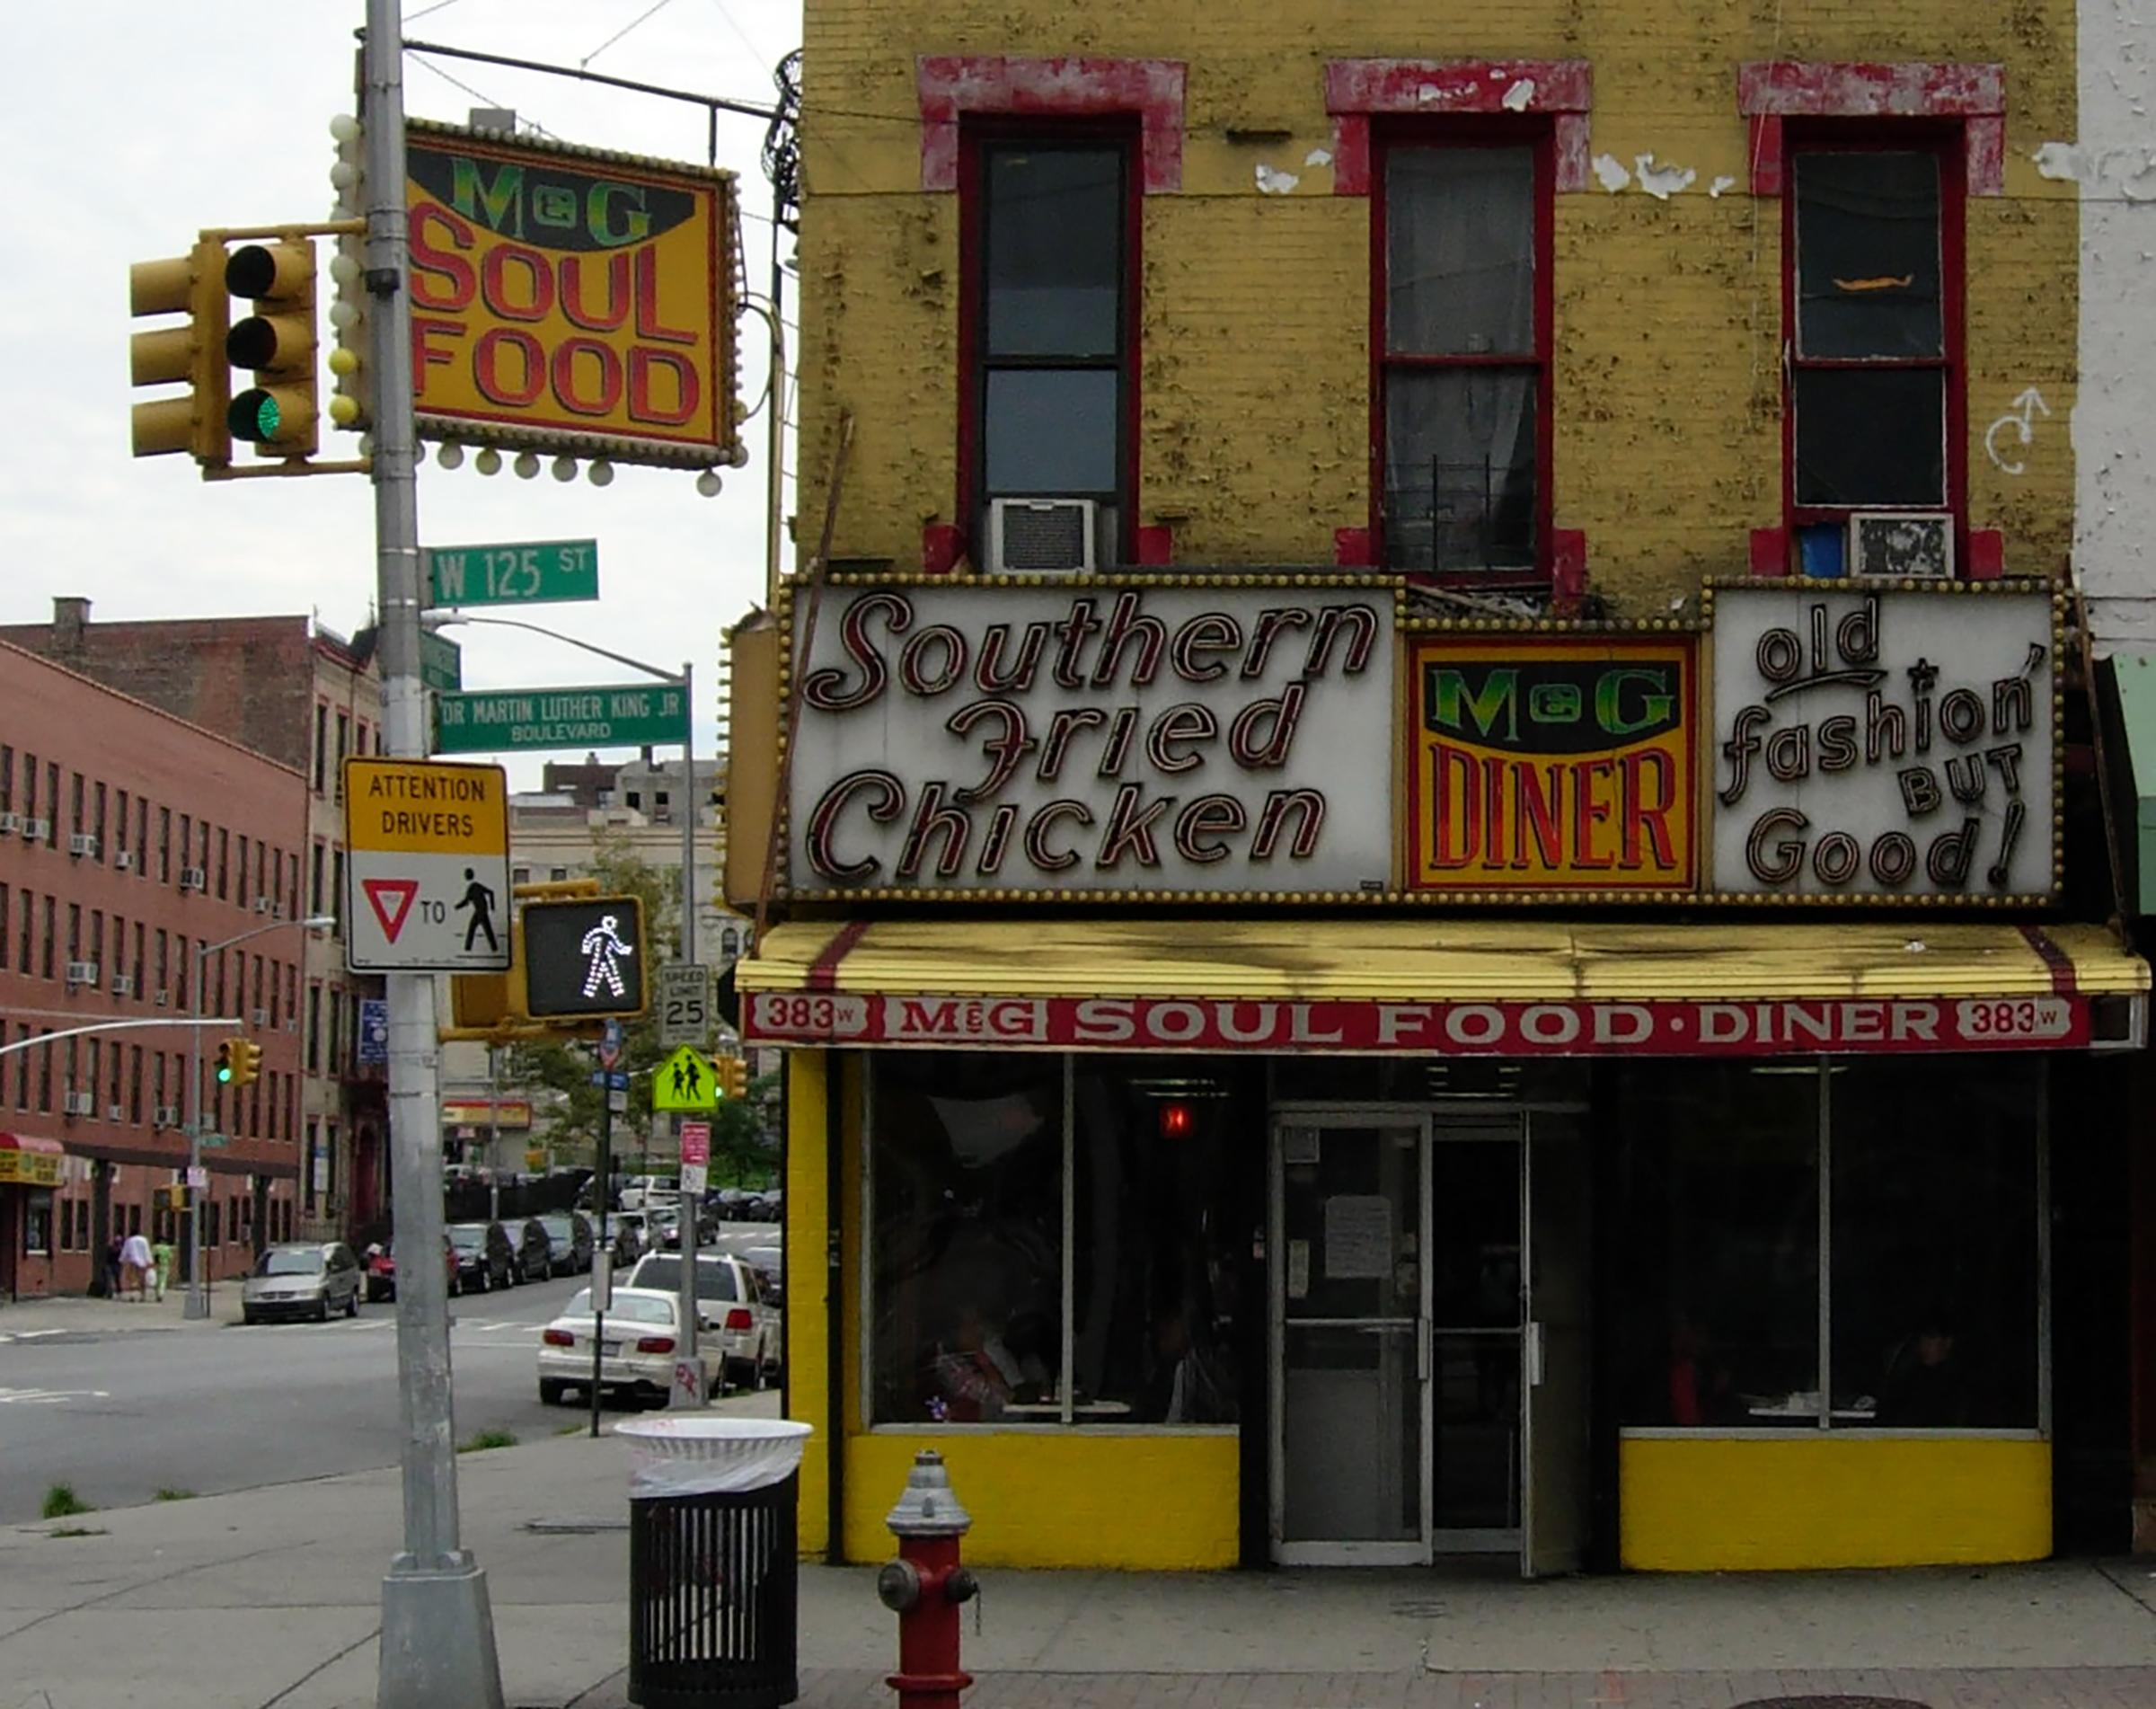 M&G Soul Food Diner in Harlem, Courtesy of Food Prof Productions